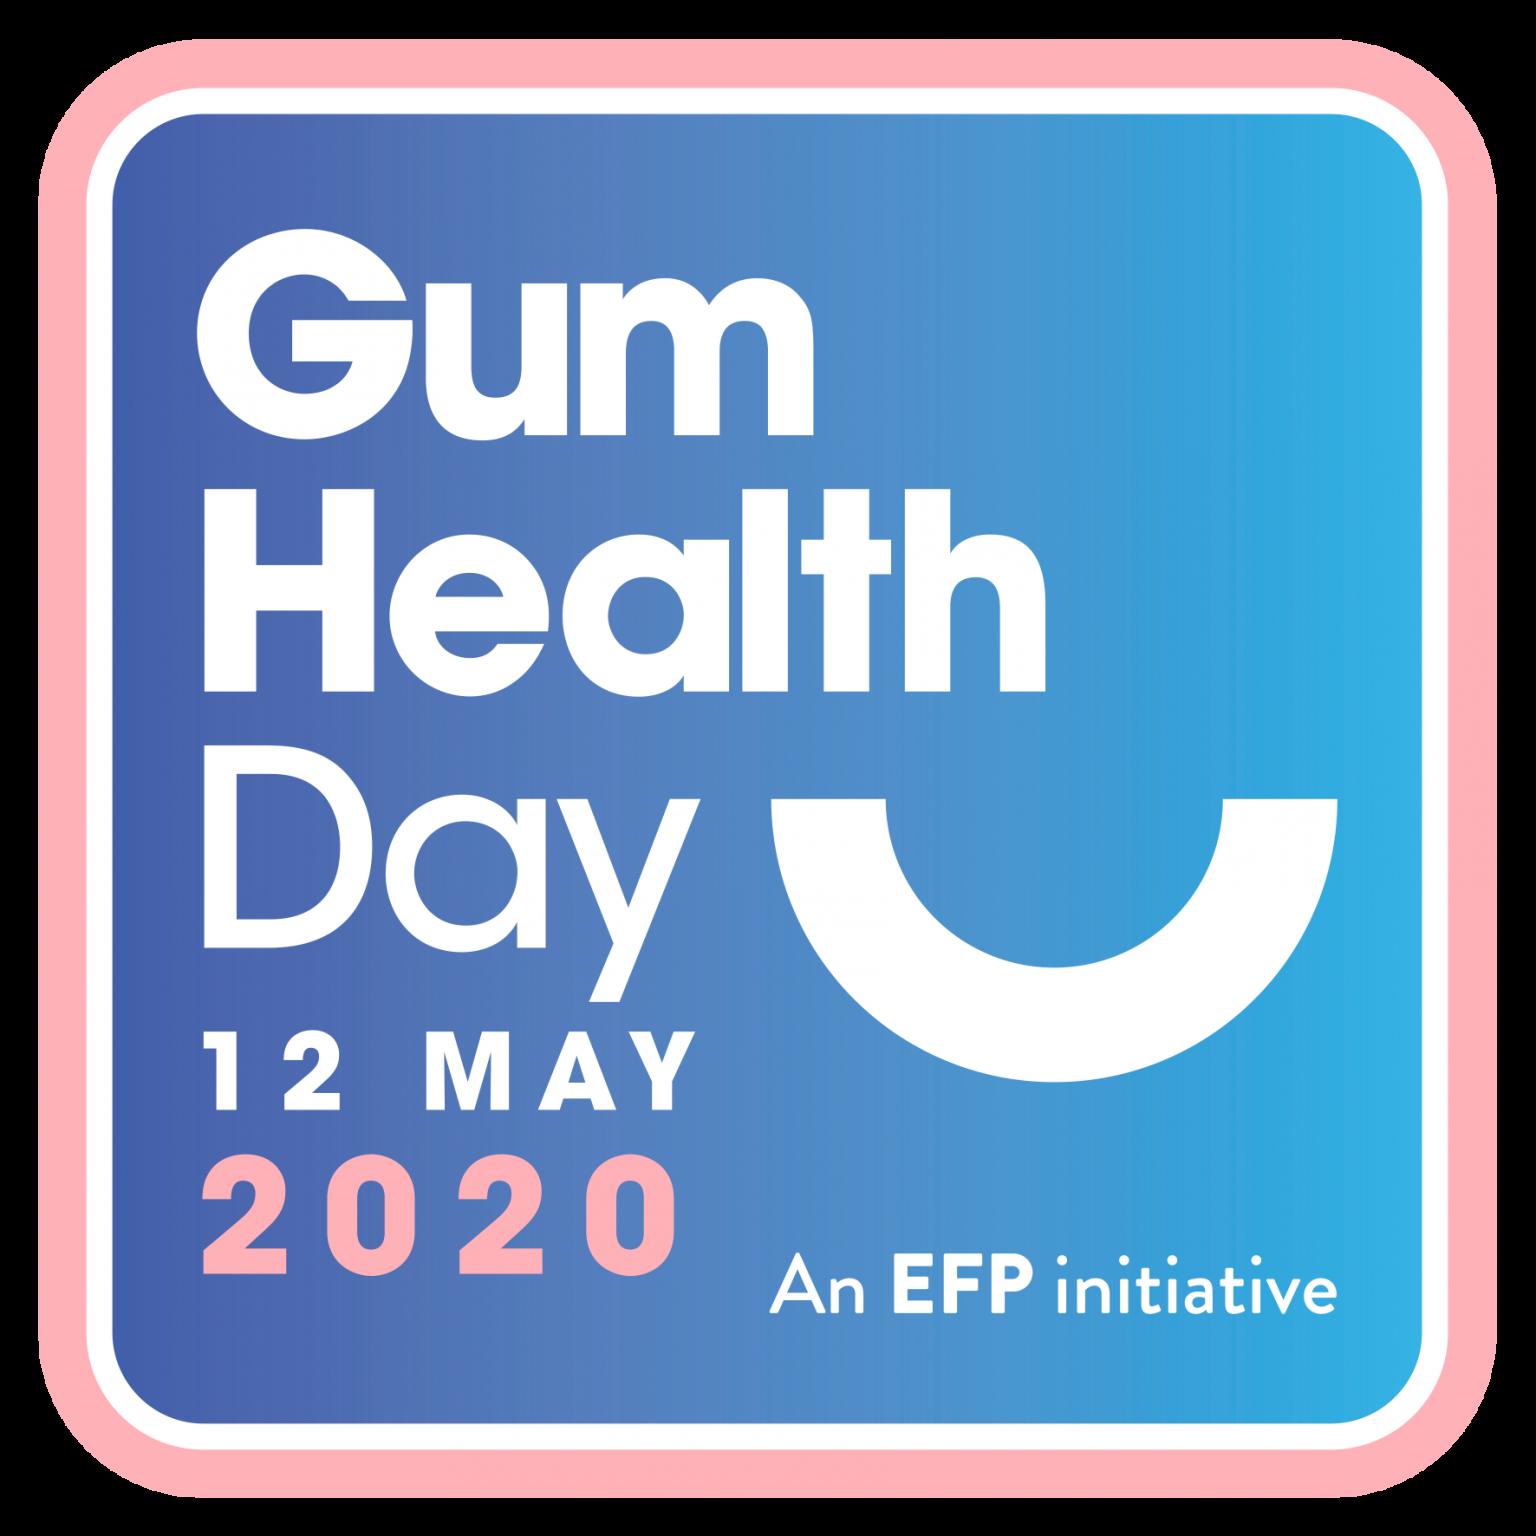 E-BOOK: GUM HEALTH DAY - INICIATIVA:  EUROPEAN FEDERATION OF PERIODONTOLOGY